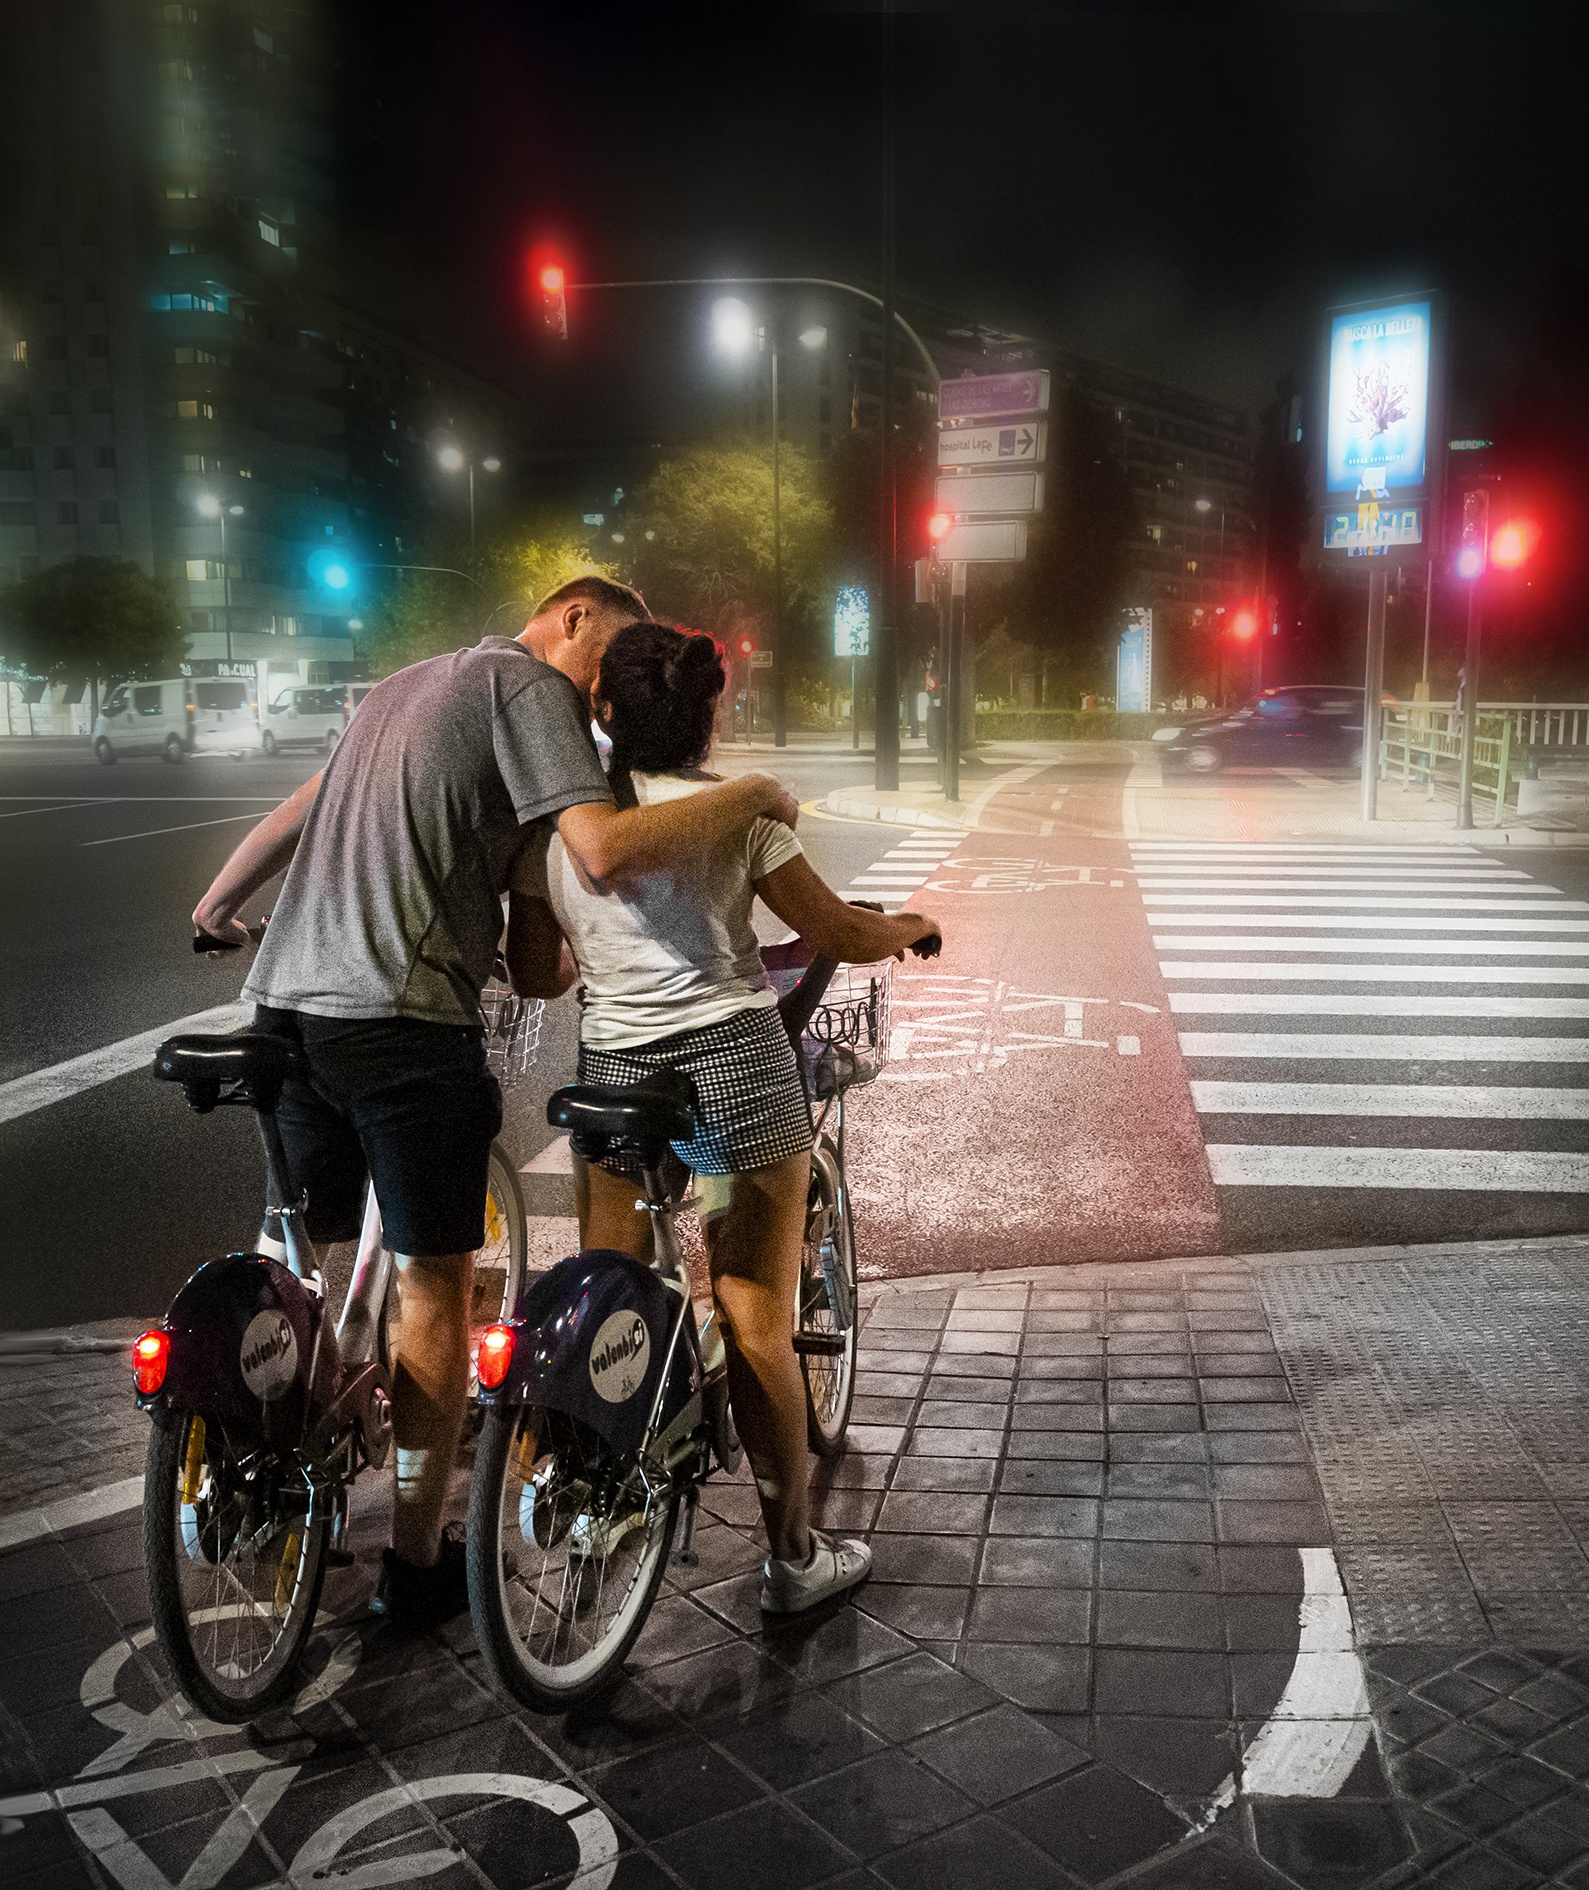 Valencia 2019 (E) - Street-colors - Urbano Suárez,  FineArt Photography